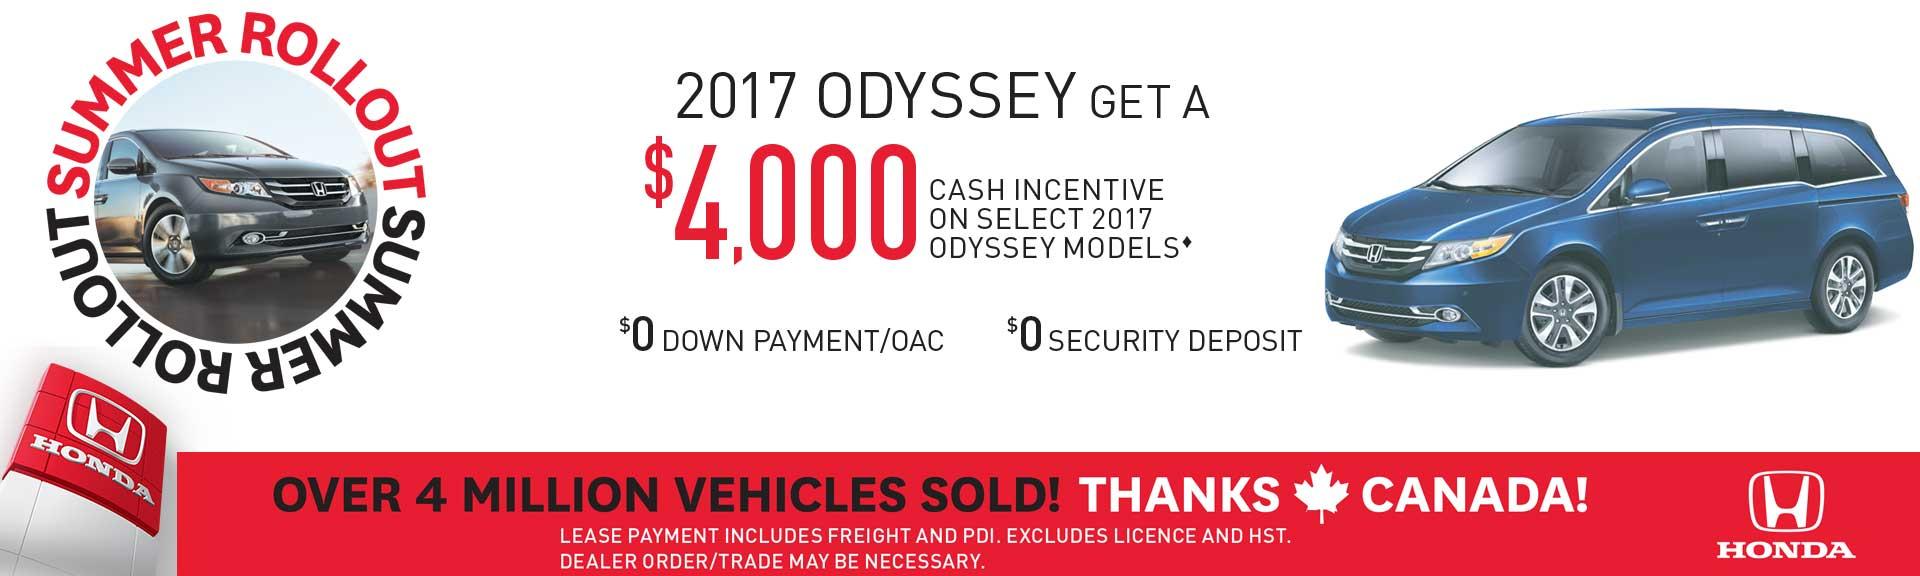 2017 Odyssey